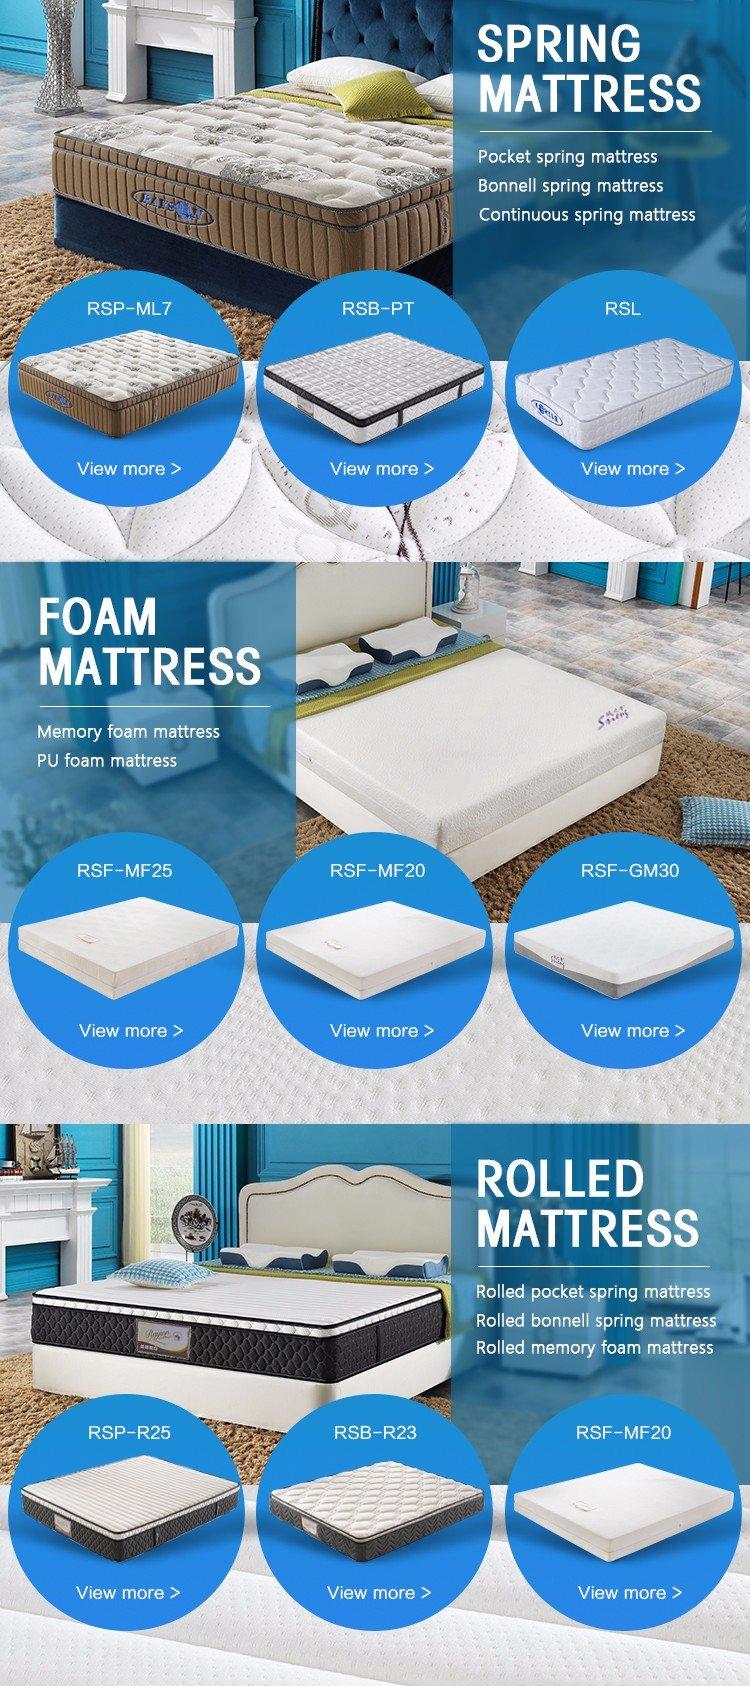 Rayson Mattress pack pocket 2000 spring pillow top orthopaedic mattress Supply-9